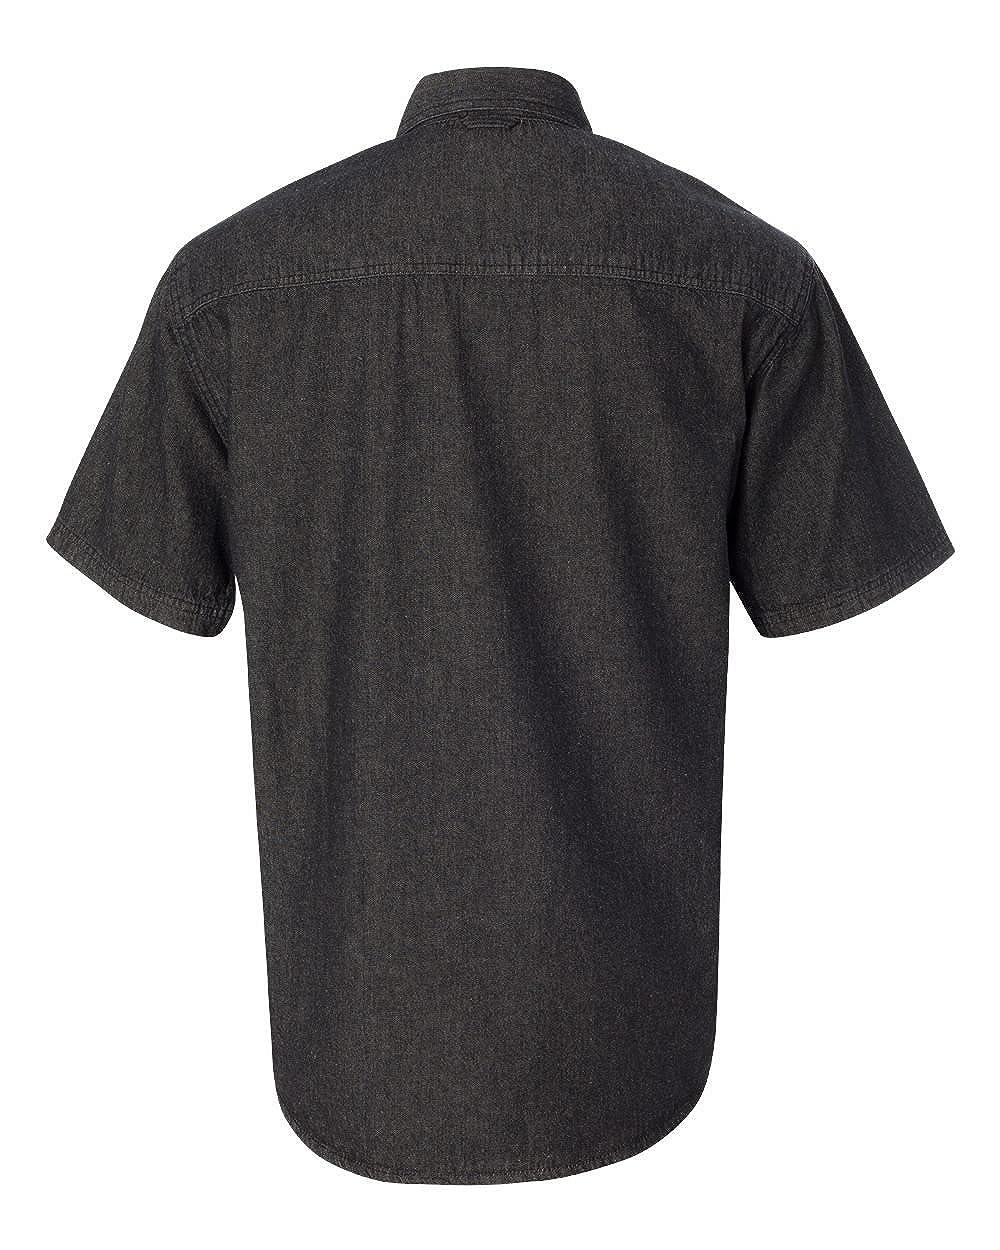 Sierra Pacific Mens Short Sleeve Pocket Denim Shirt